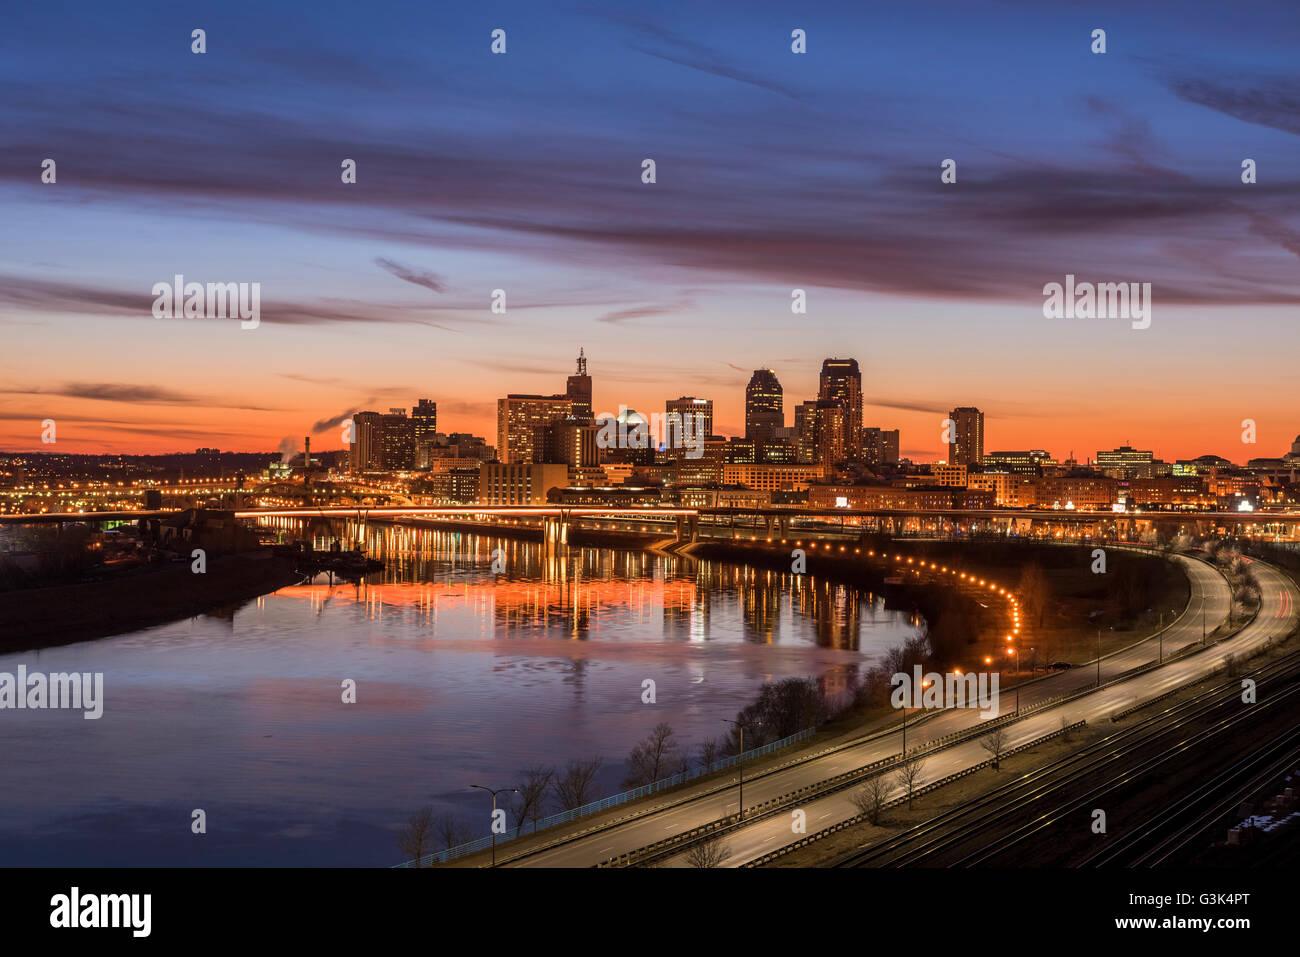 Saint Paul Minnesota skyline from Dayton's Bluff along the Mississippi River. - Stock Image